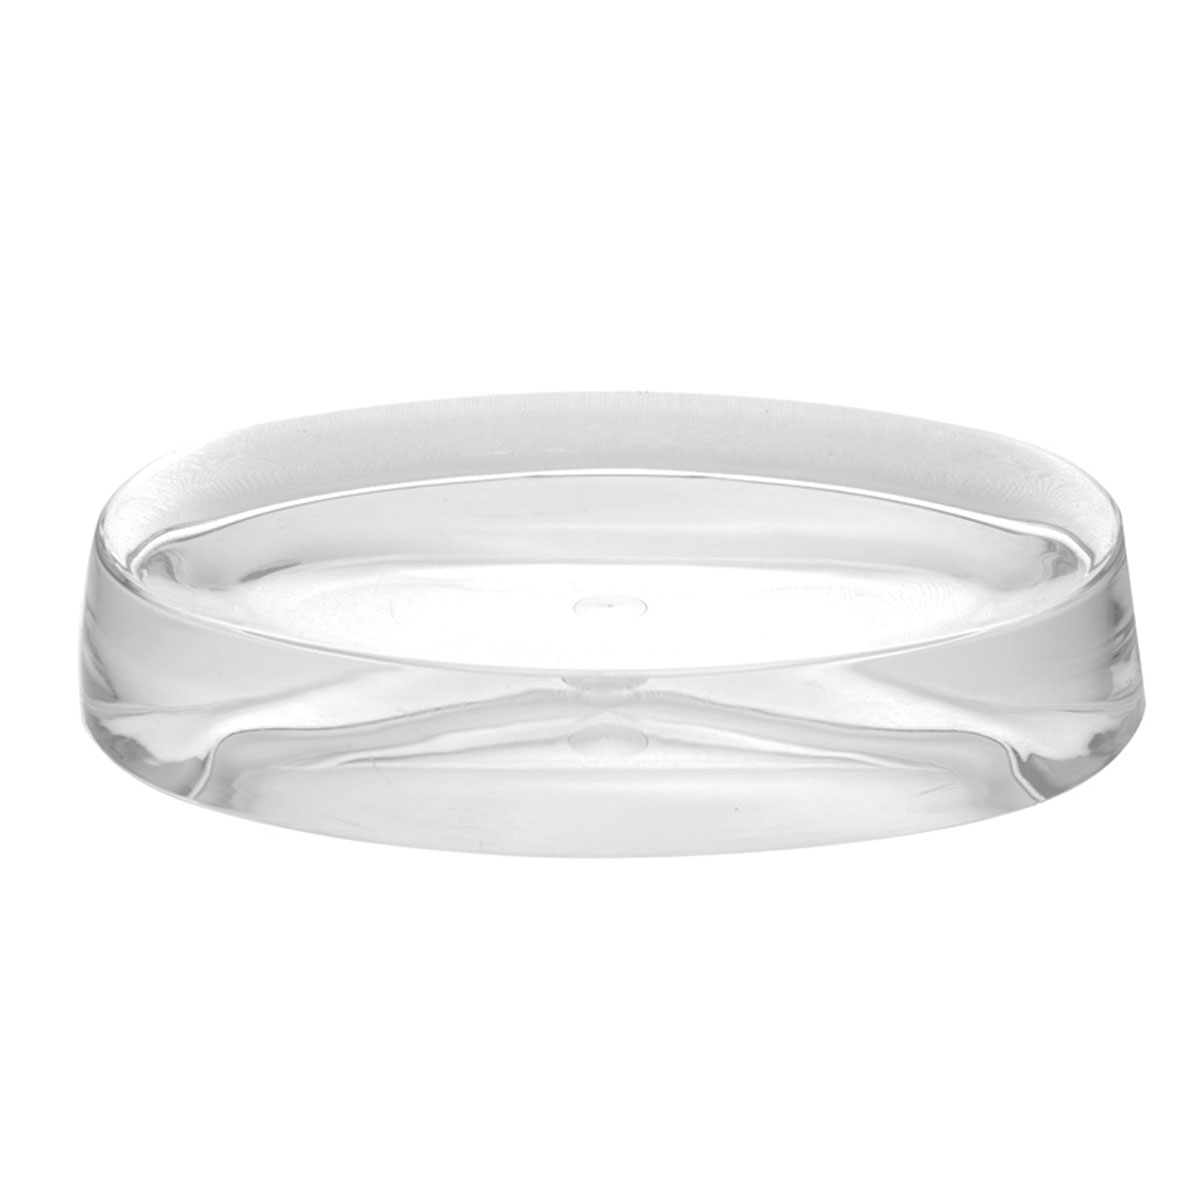 Porte savon transparent (Transparent)